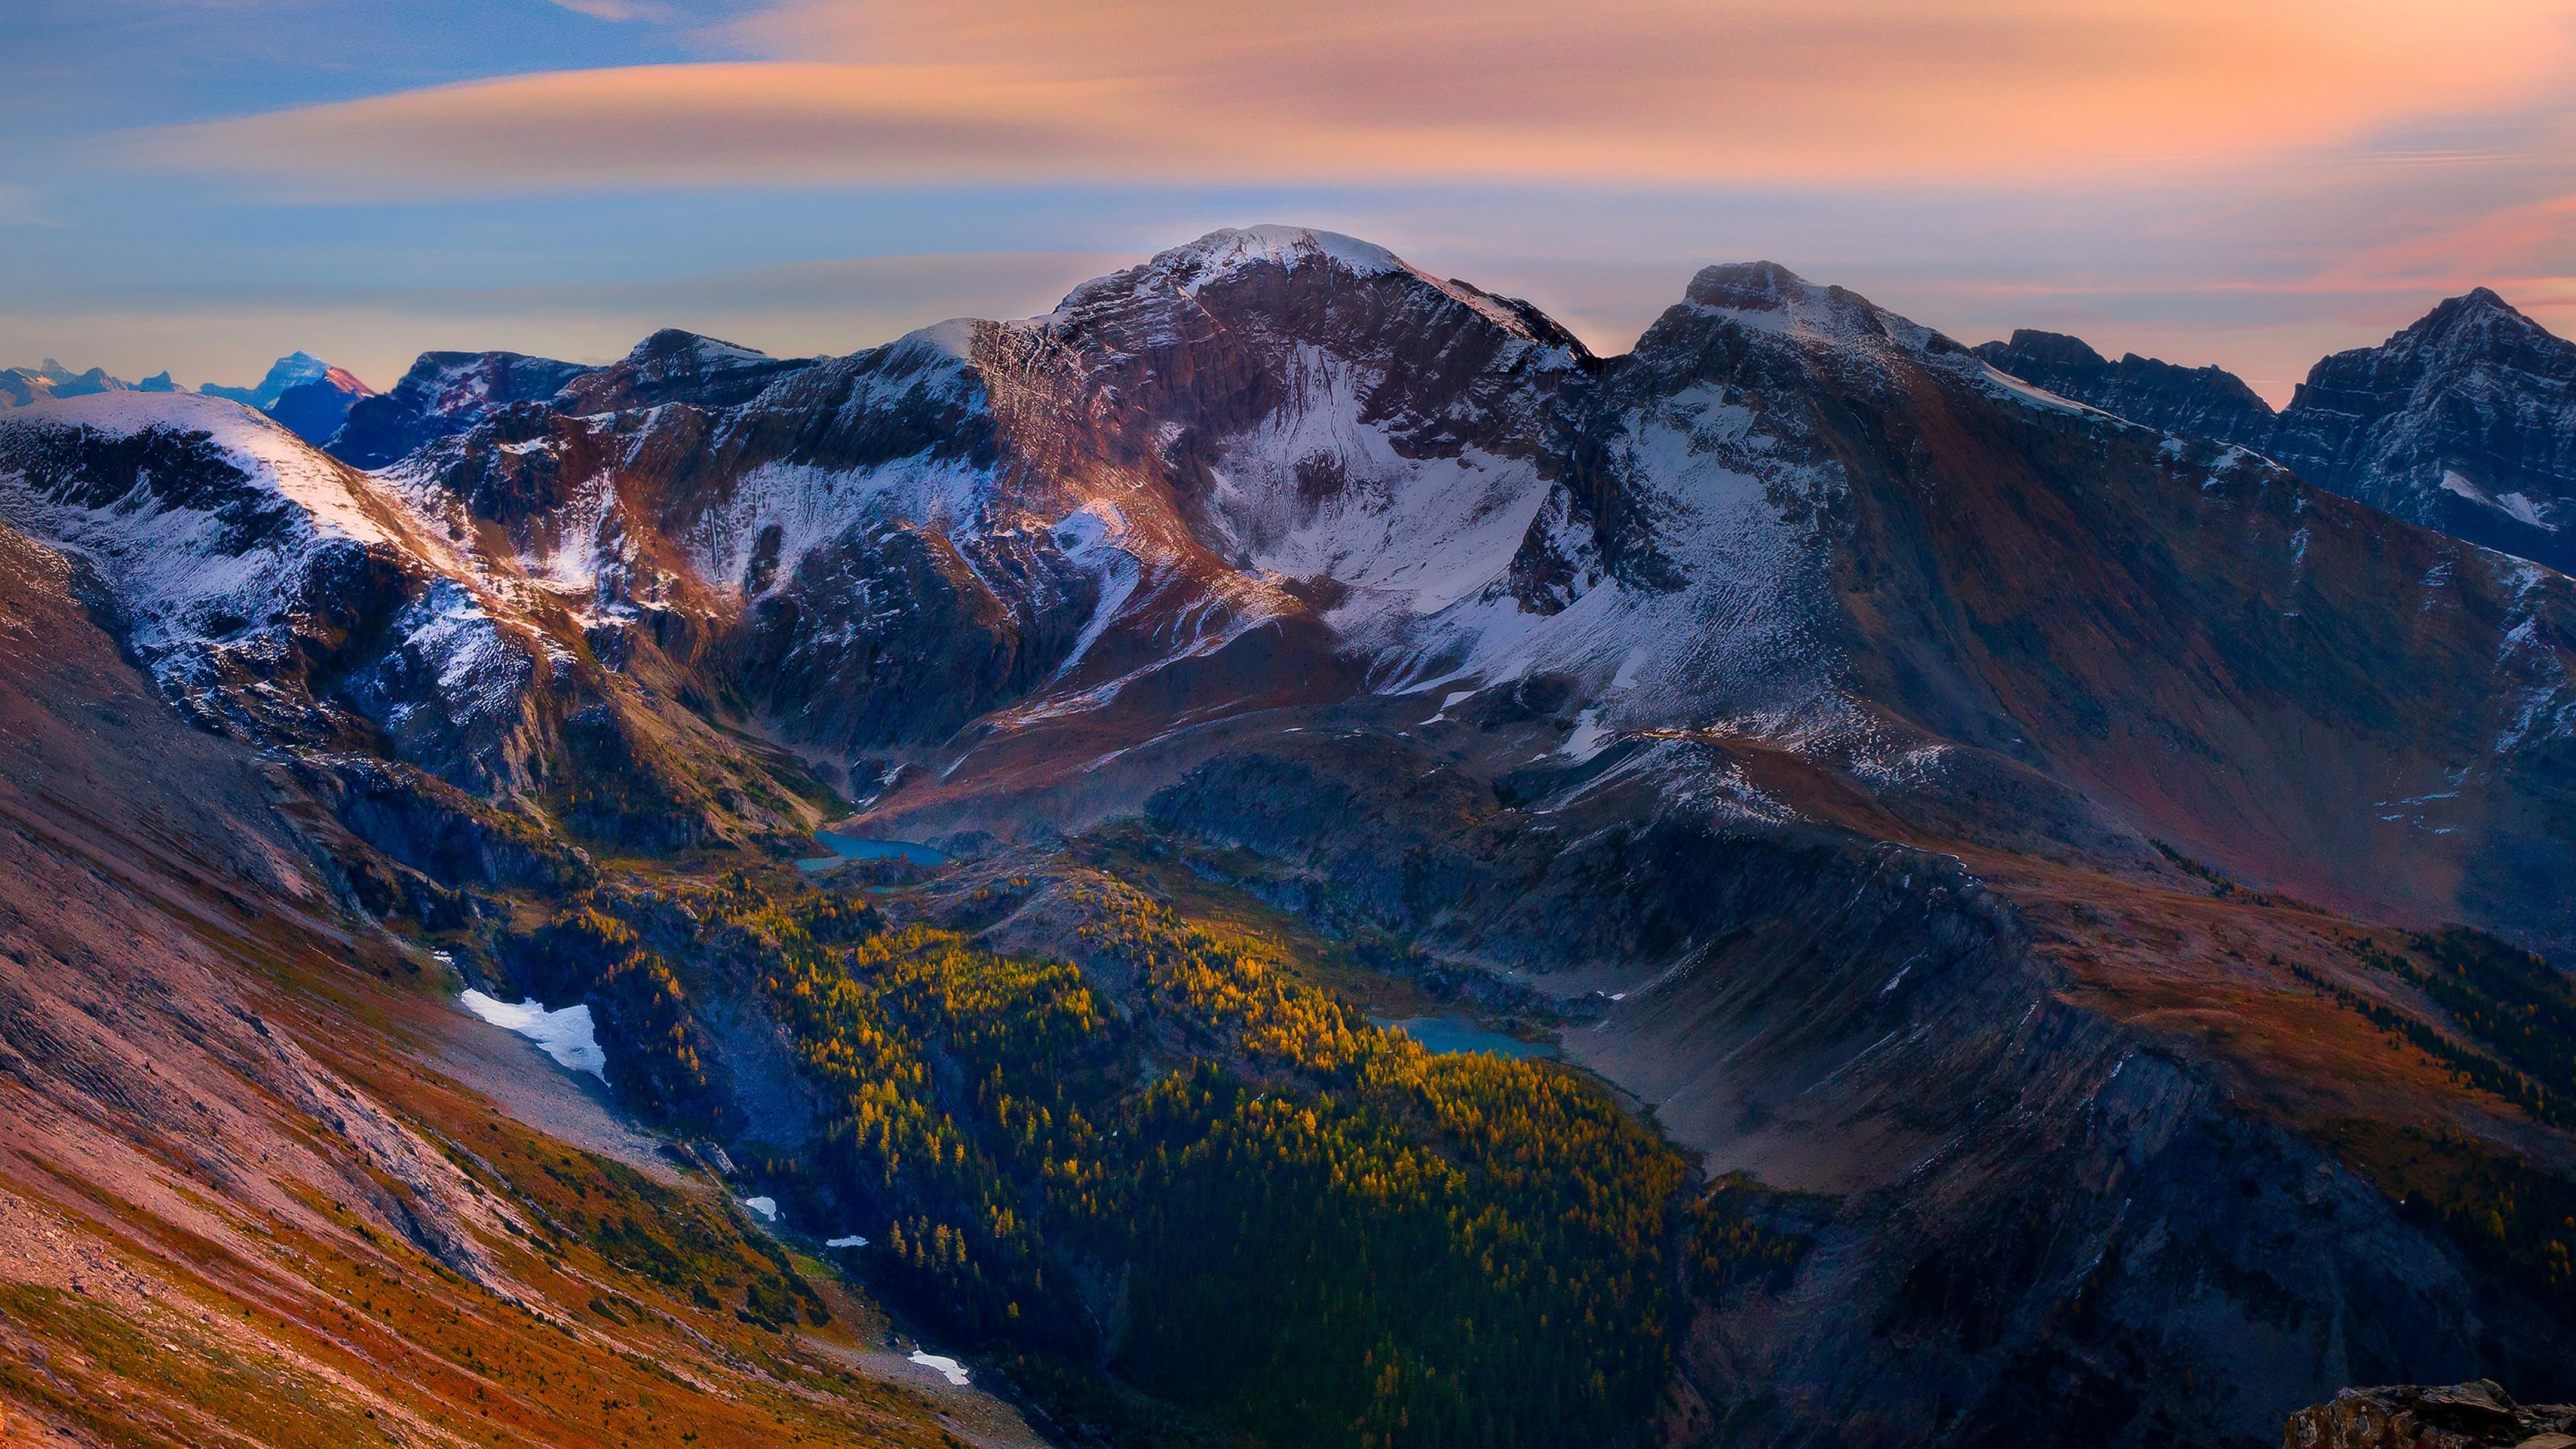 Good Wallpaper Mountain Google Nexus - mountain-peaks-beautiful-scenery  Picture_519387.jpg